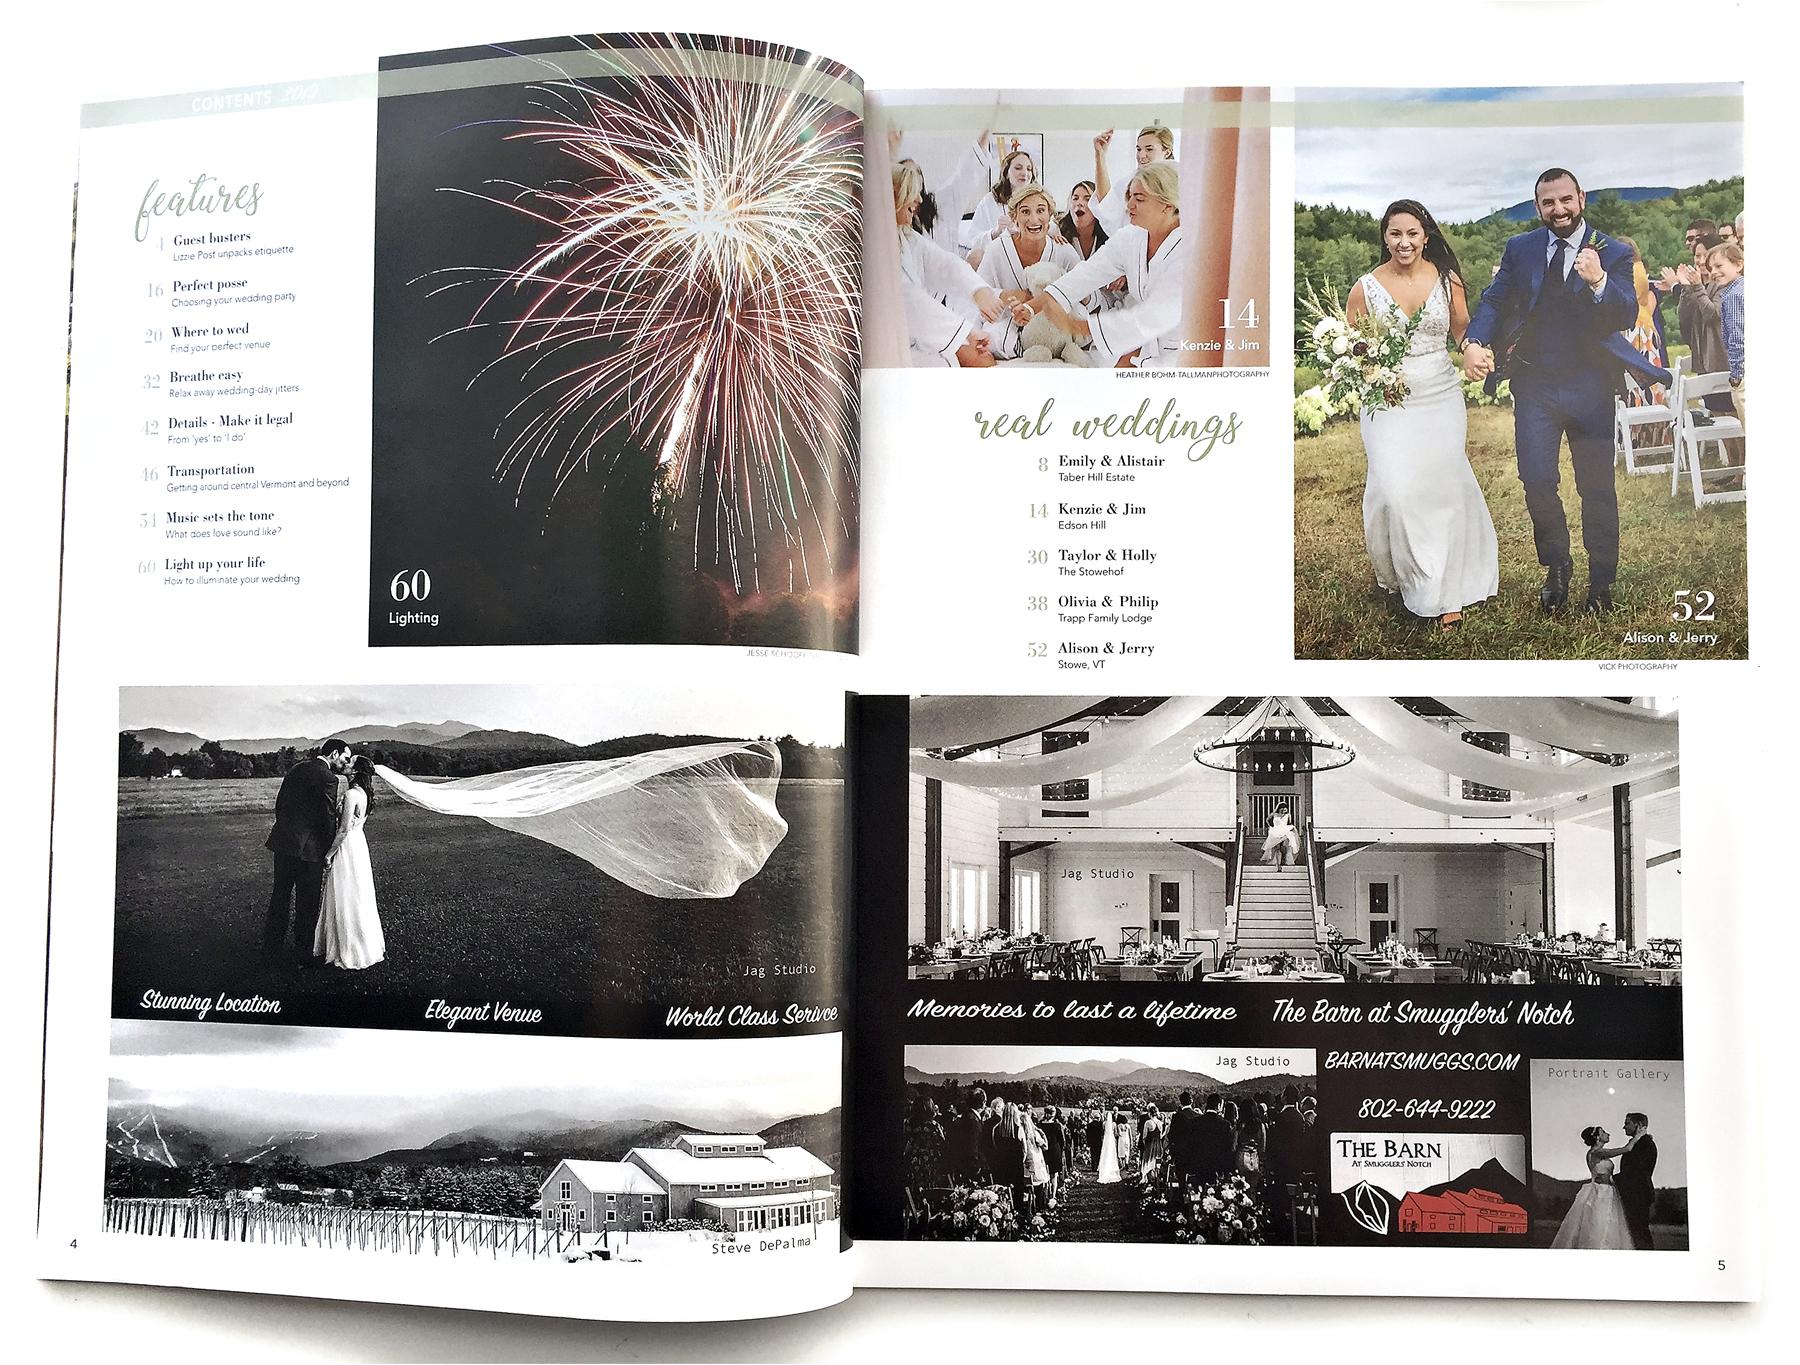 02 Vick Photography Feature Stowe Wedding Magazine 2019.jpg